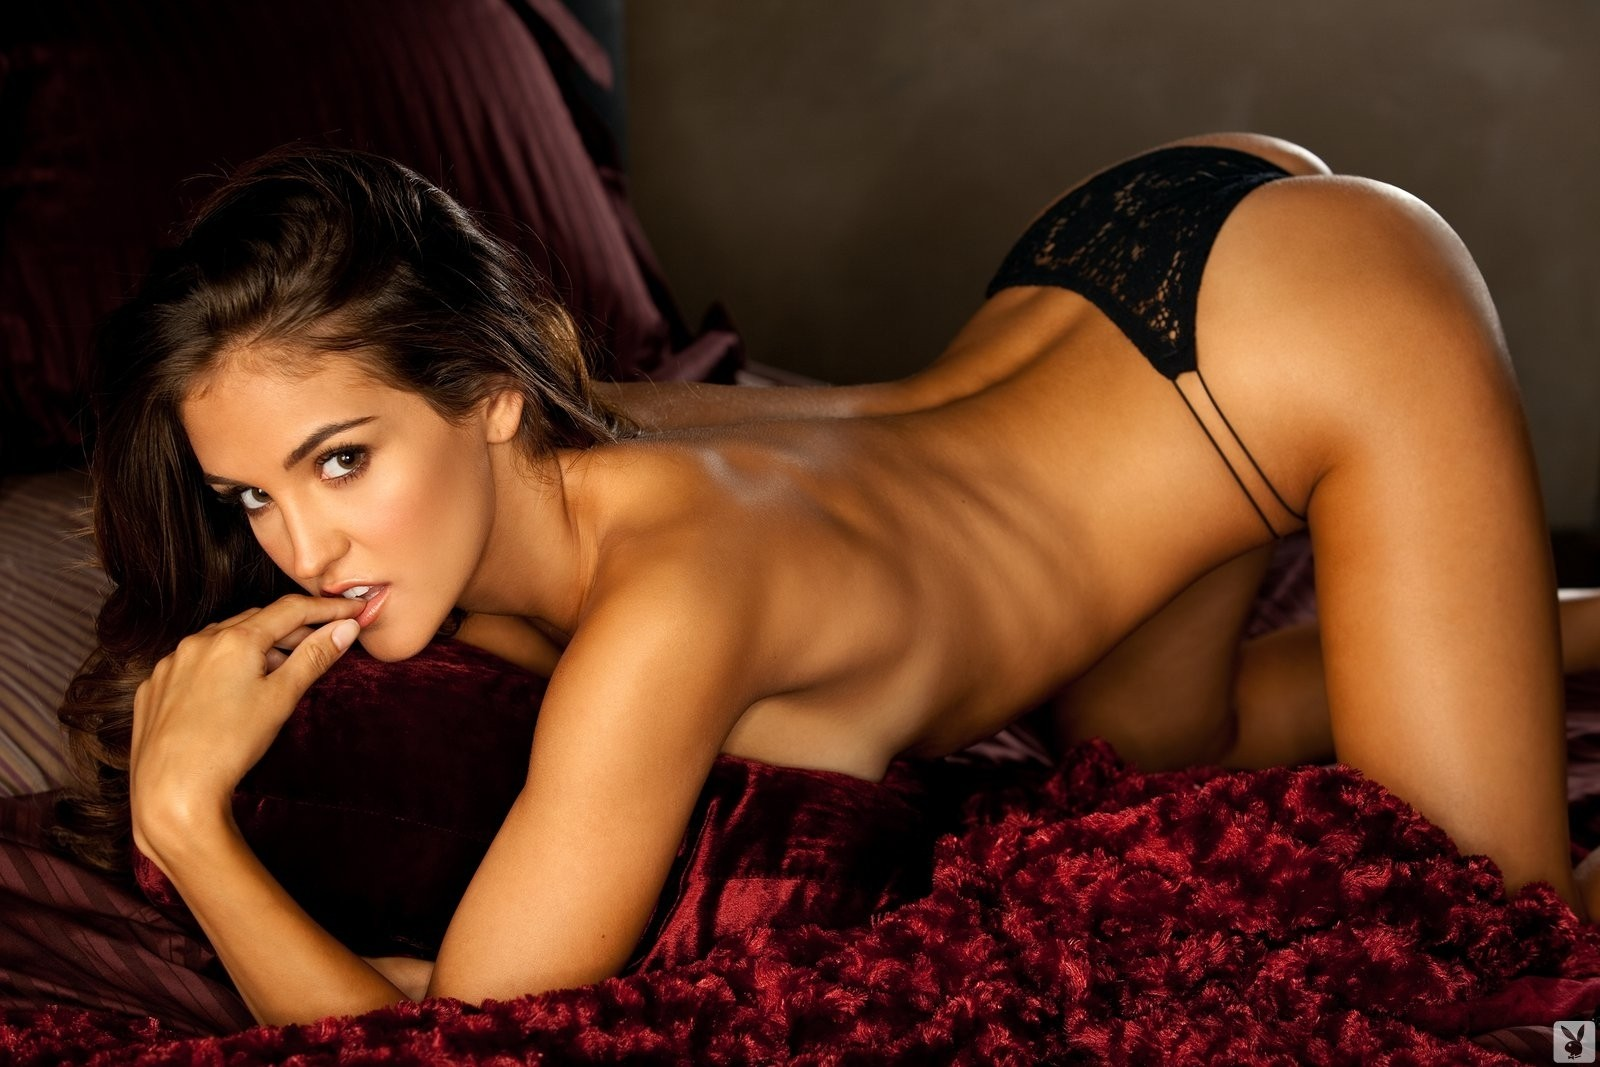 Asian Beauty, Sexy Woman Model Stock Photo